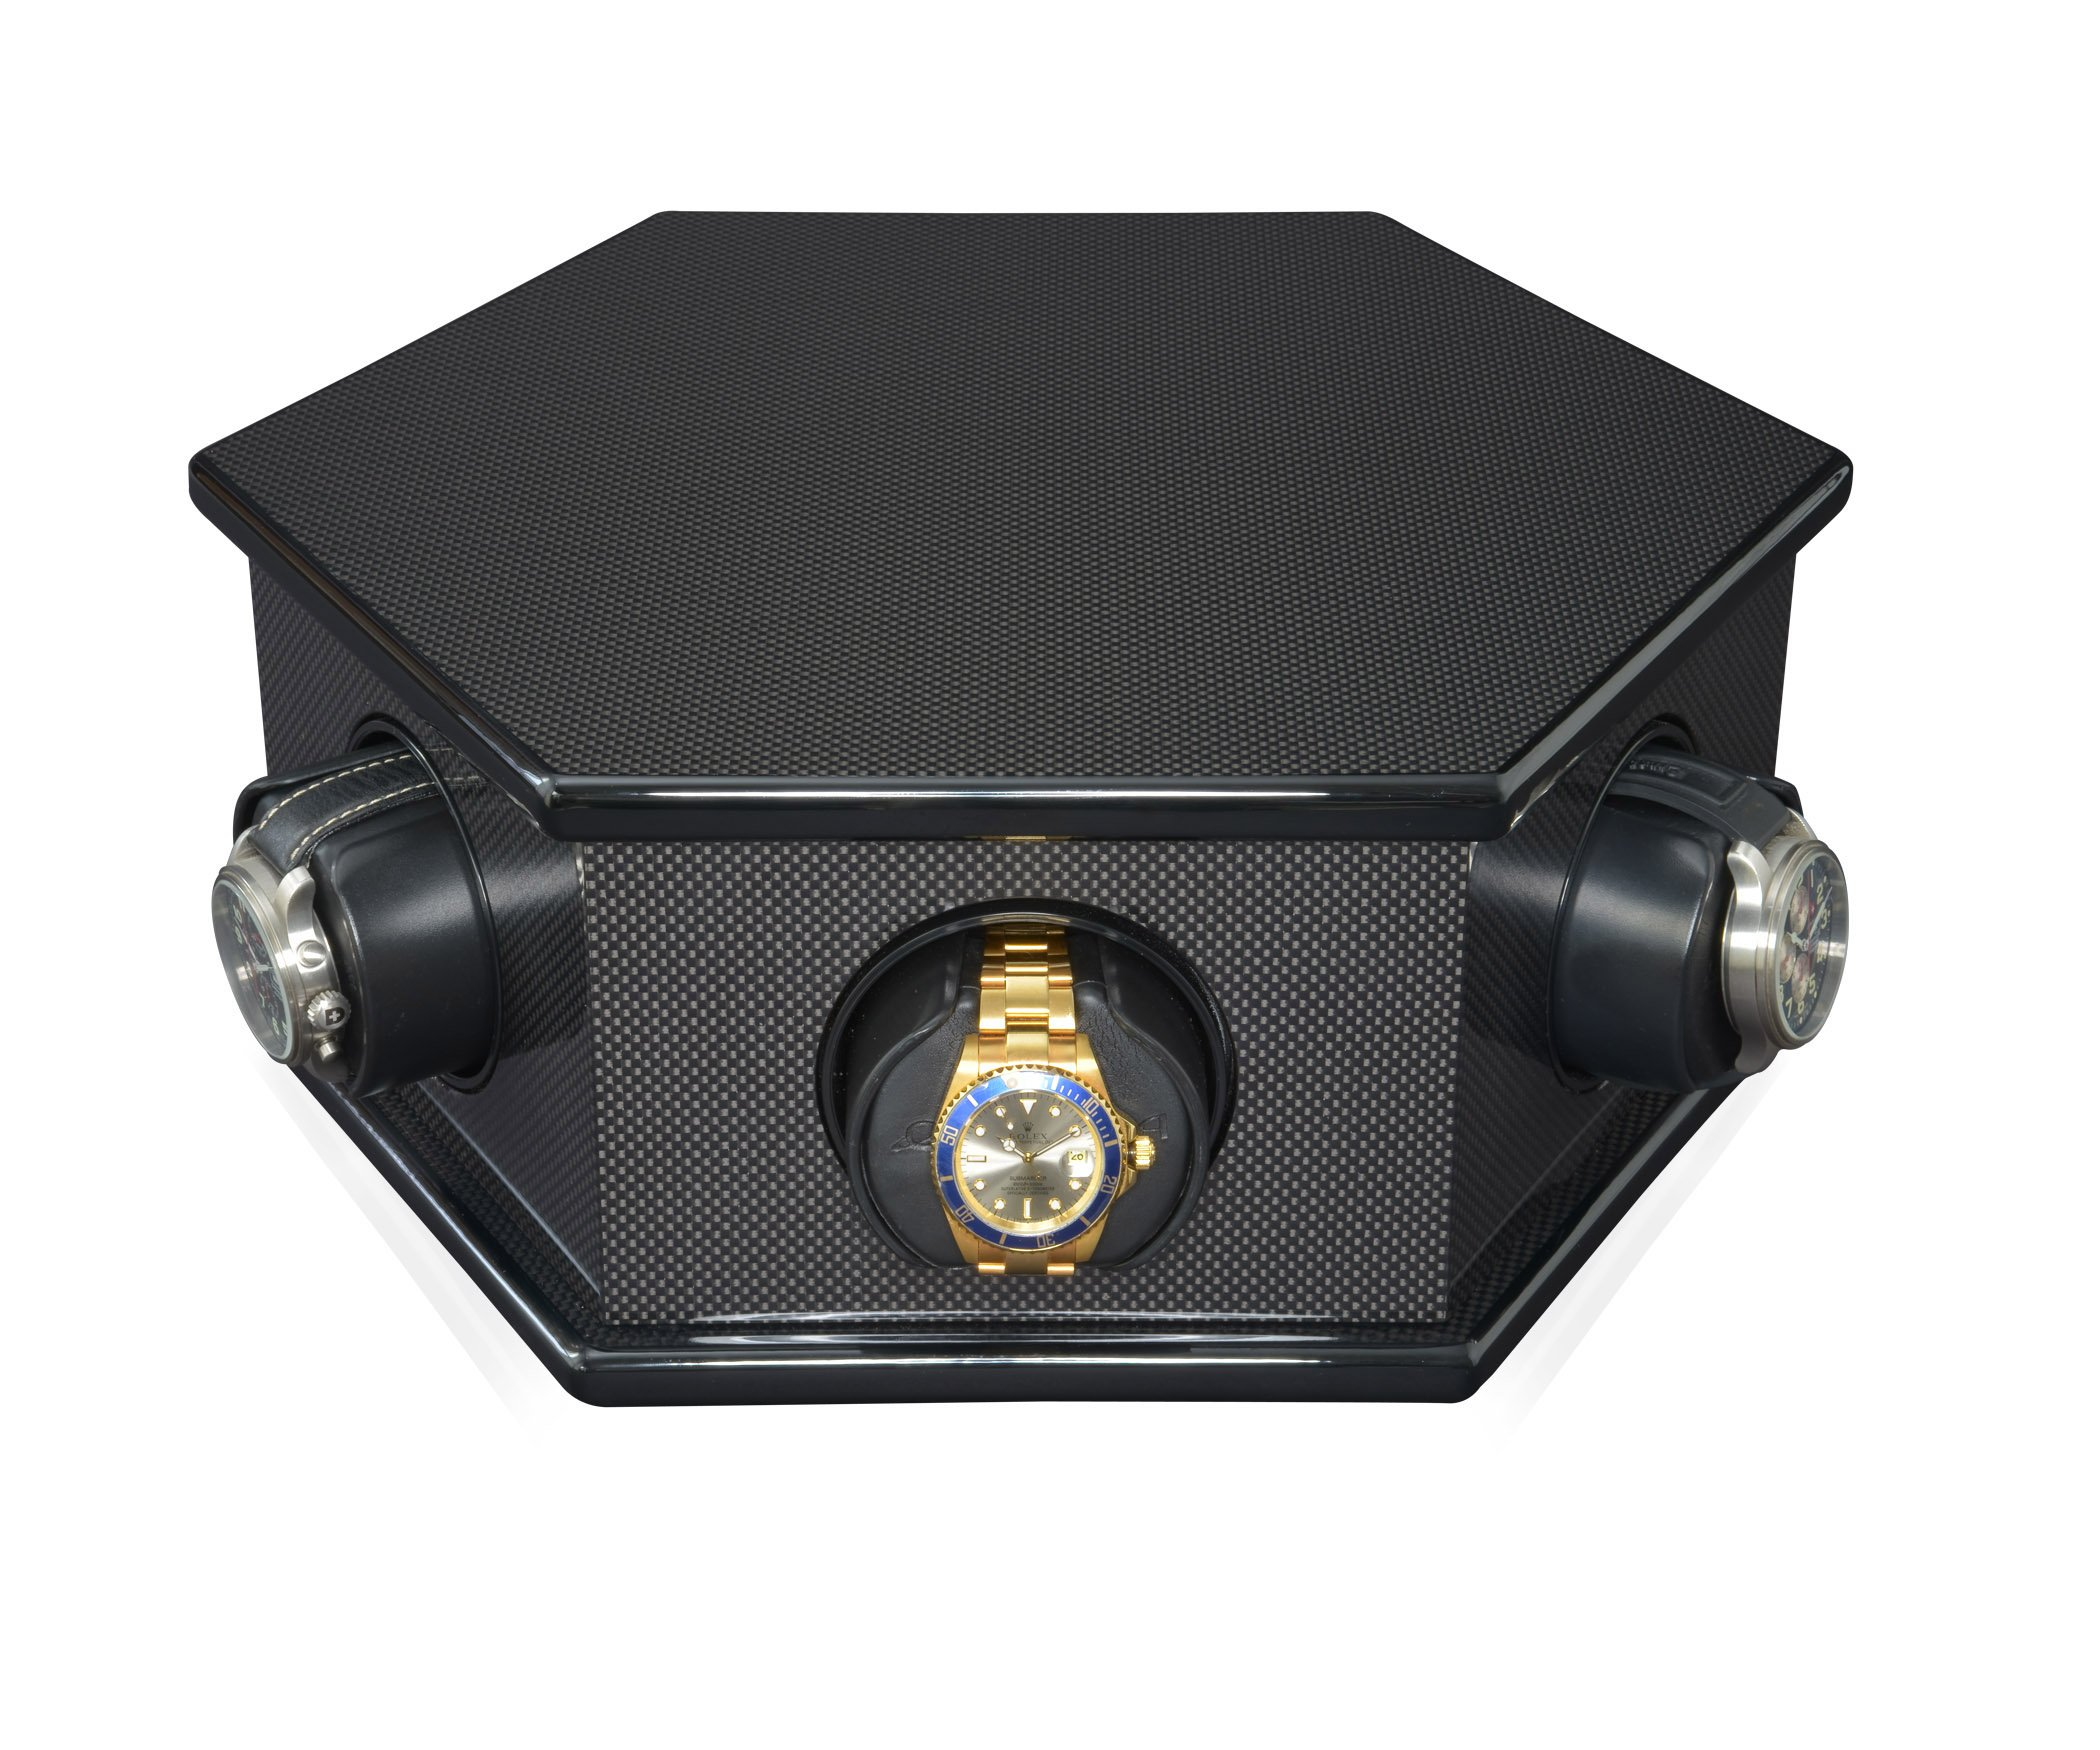 ORBITA CAROLO 6 Rotorwind Watch Winder in Black Carbon Fiber, Made in the USA